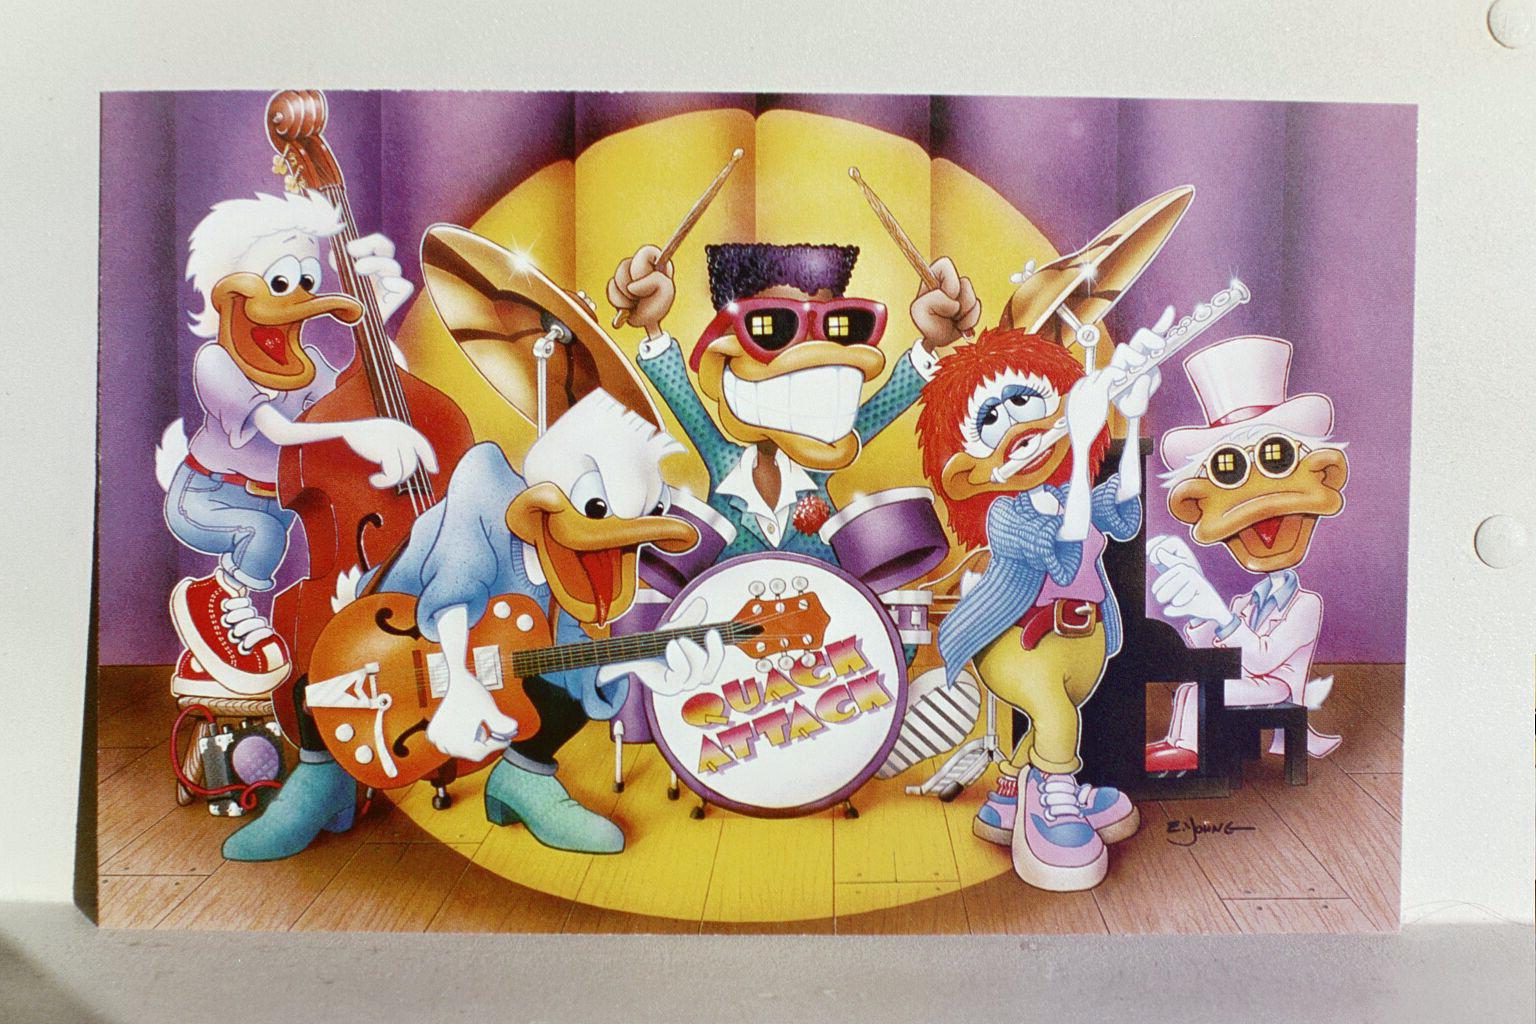 Donald_Duck_Quack_Attack_Wallpaper.jpg